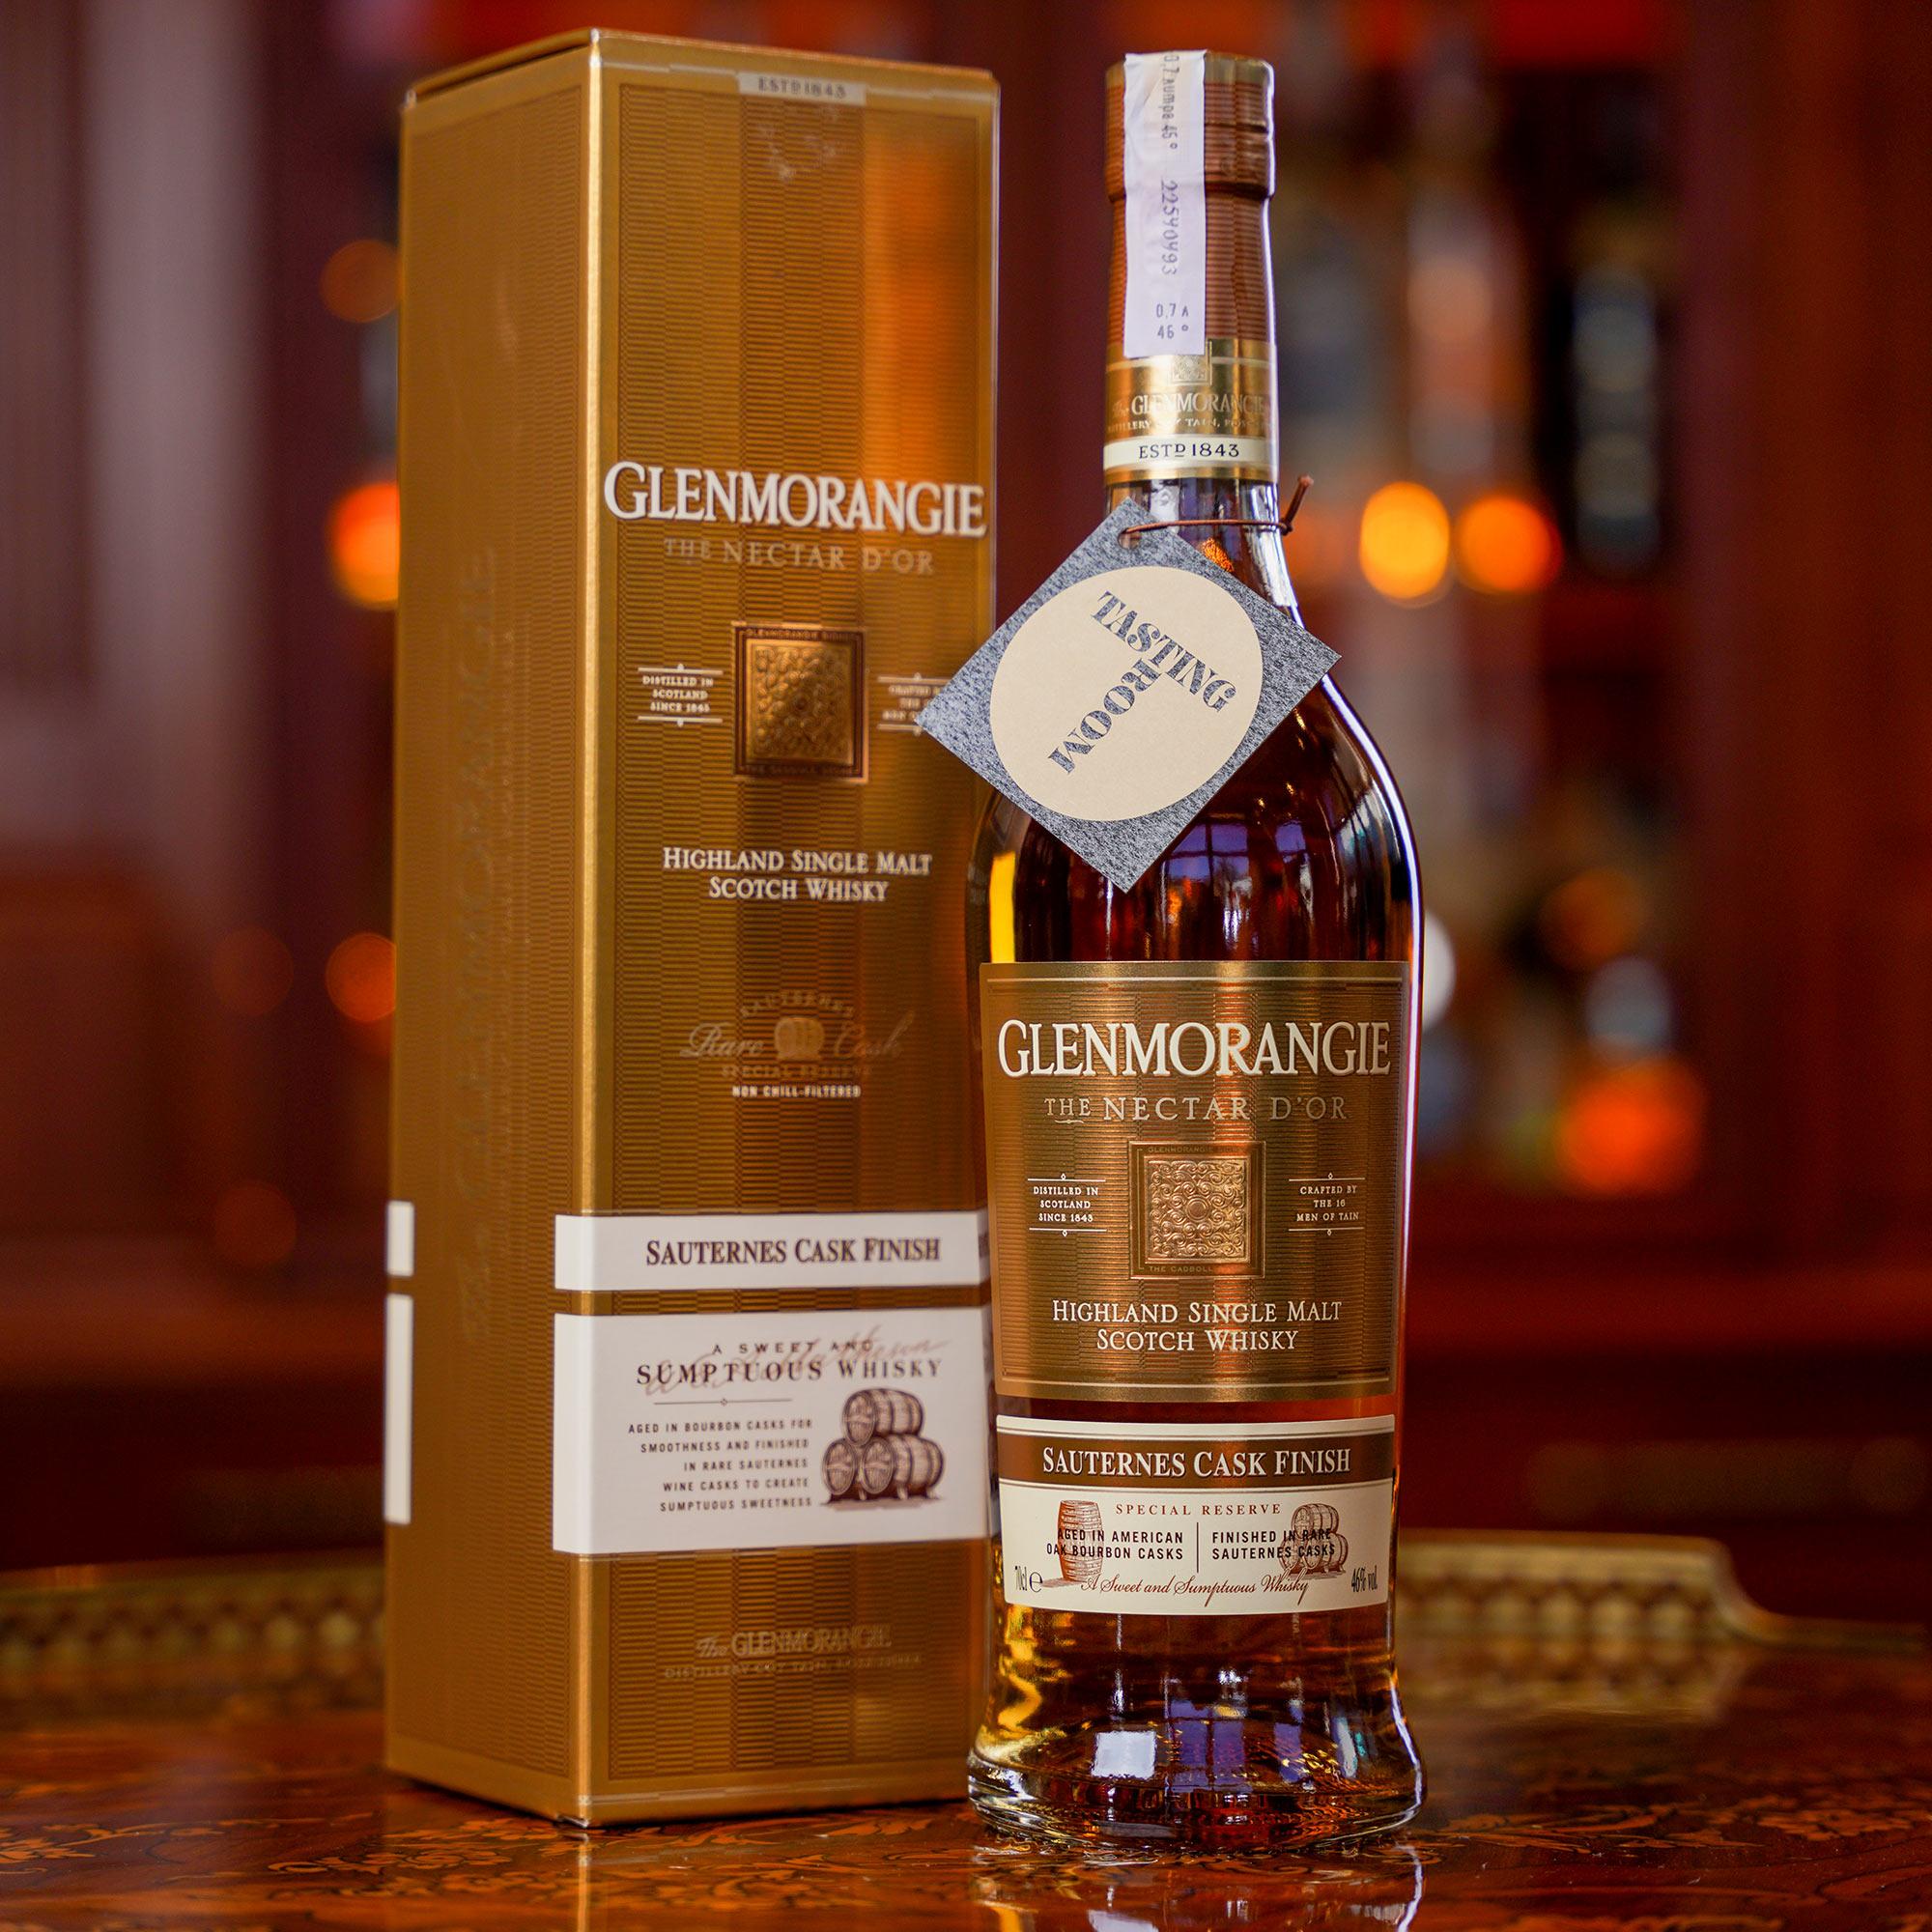 Glenmorangie The Nectar d'Or Sauternes Cask /Гленморанджи или Гленморанжи Нектар д'Ор Сутерн Каск